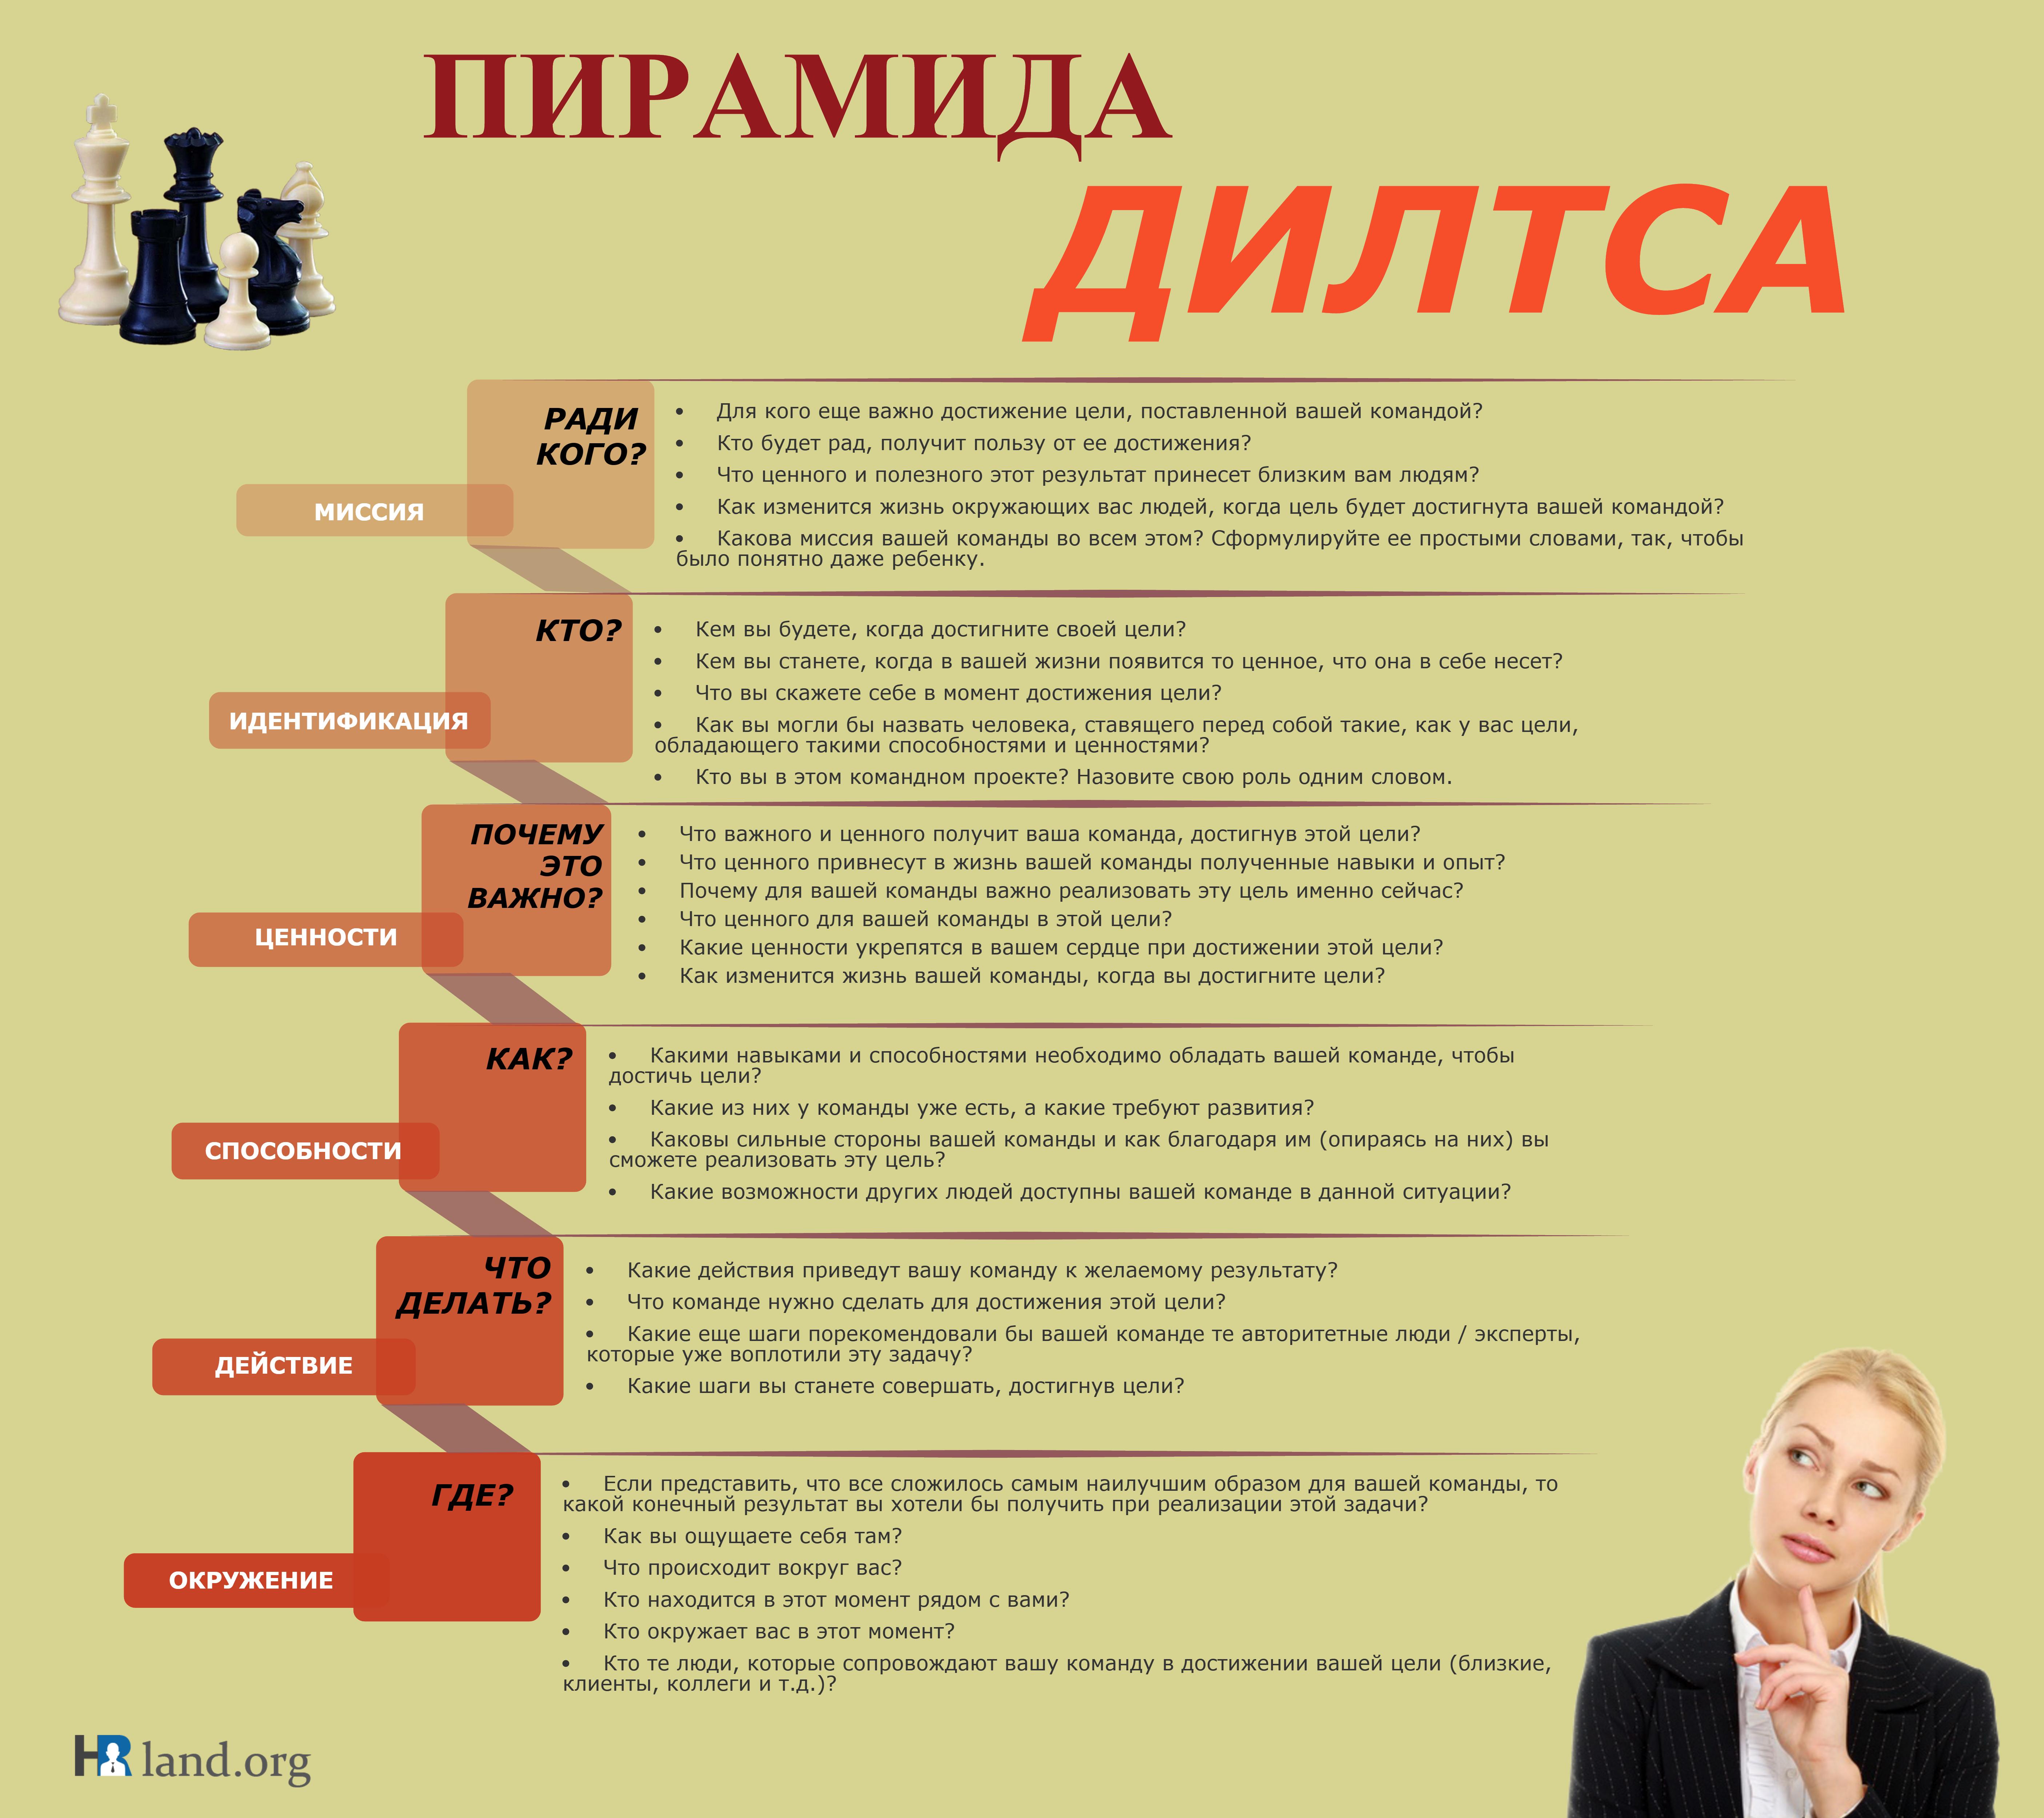 piramida-logicheskih-urovney-diltsa